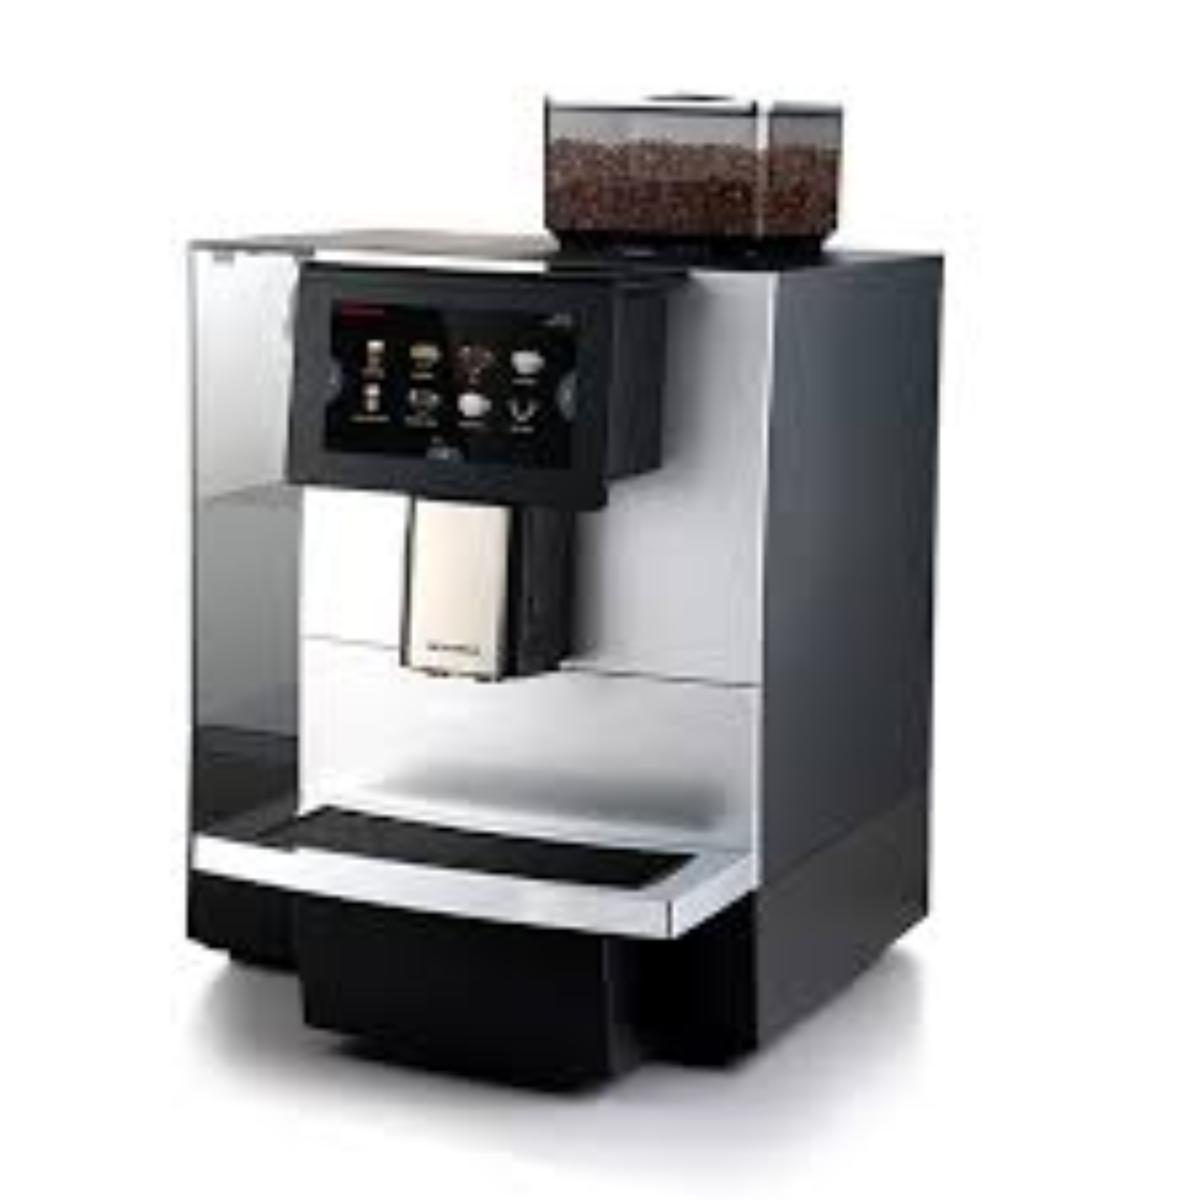 Kaffe og kaffemaskiner